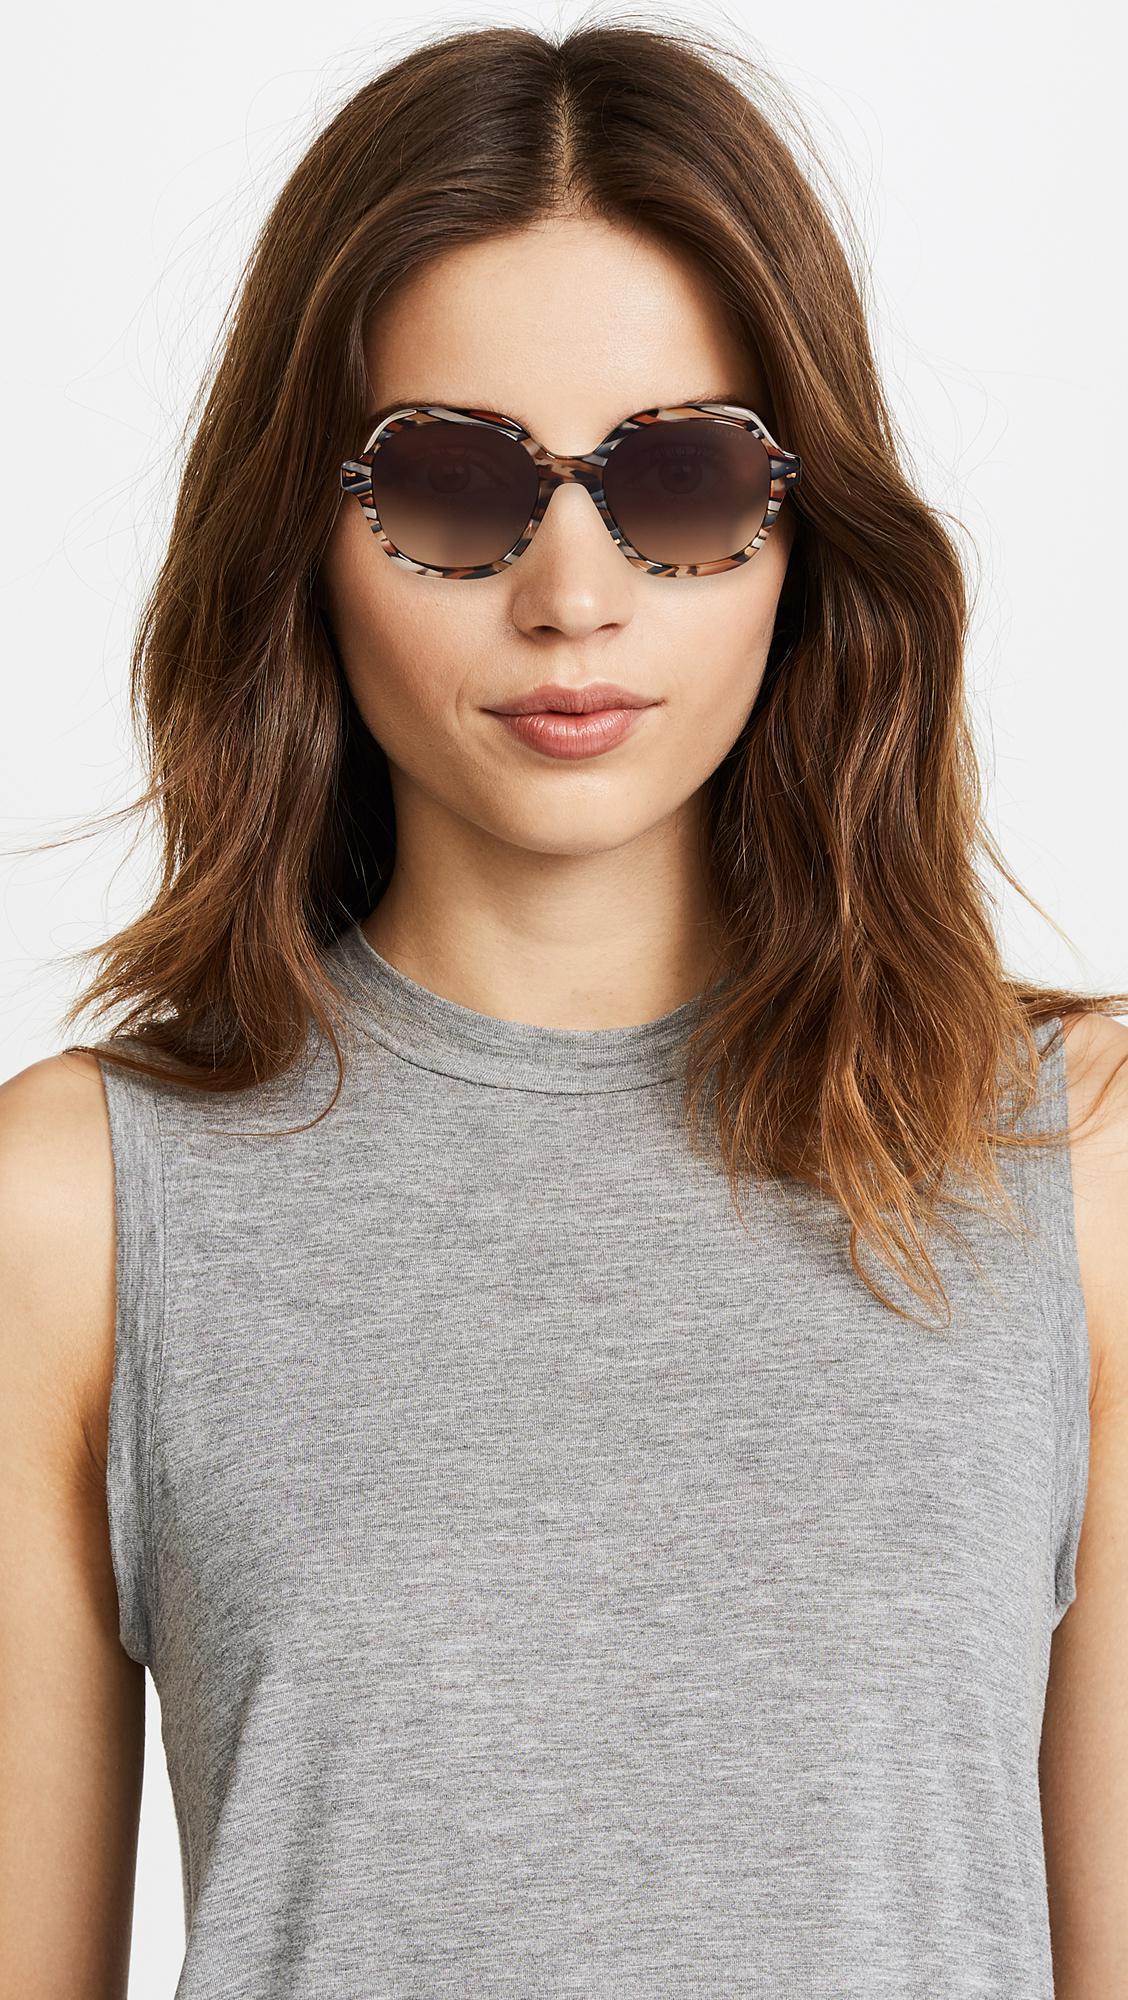 ca67bd333d5b Heritage Lyst Prada Heritage Prada Sunglasses Lyst H7qxOWn1